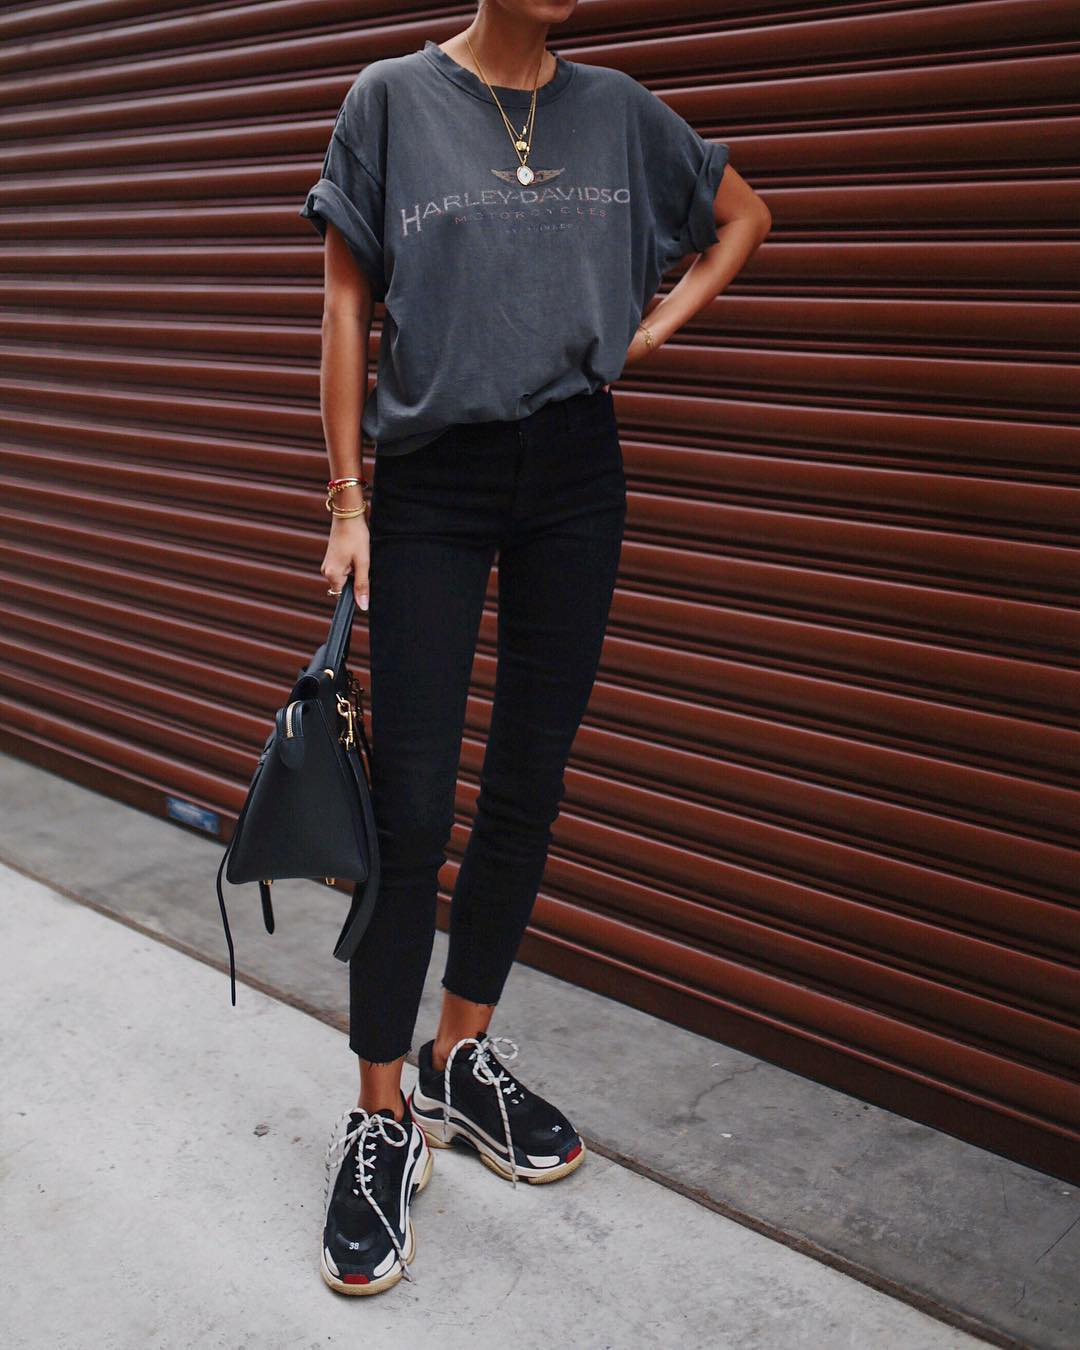 джинсы и футболка фото 10